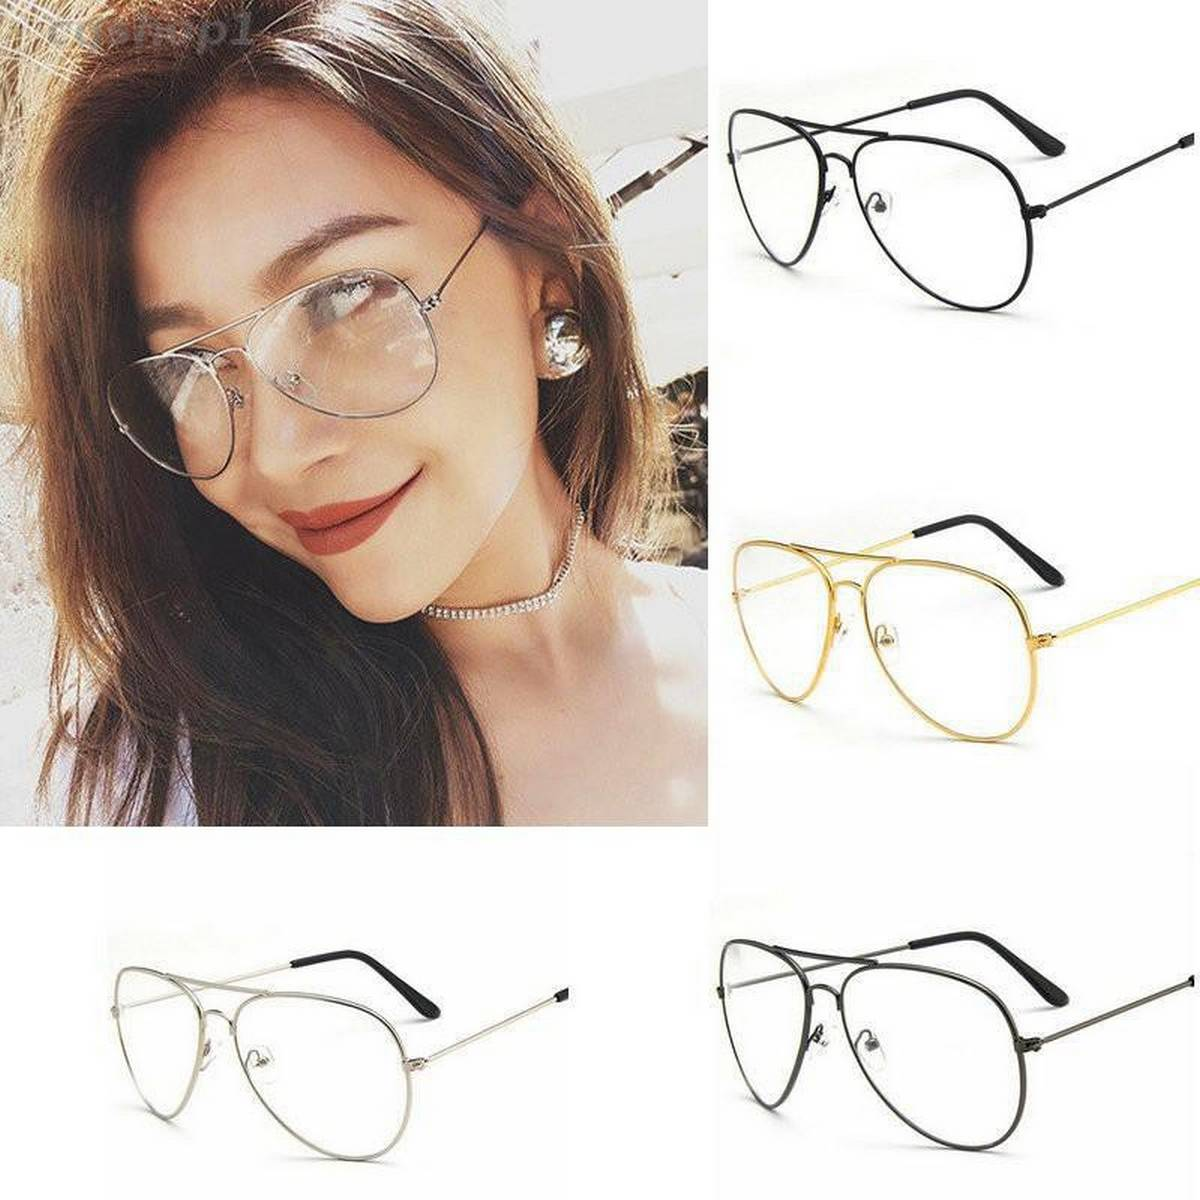 New Arrival Fashion Aviator Glasses For Girls